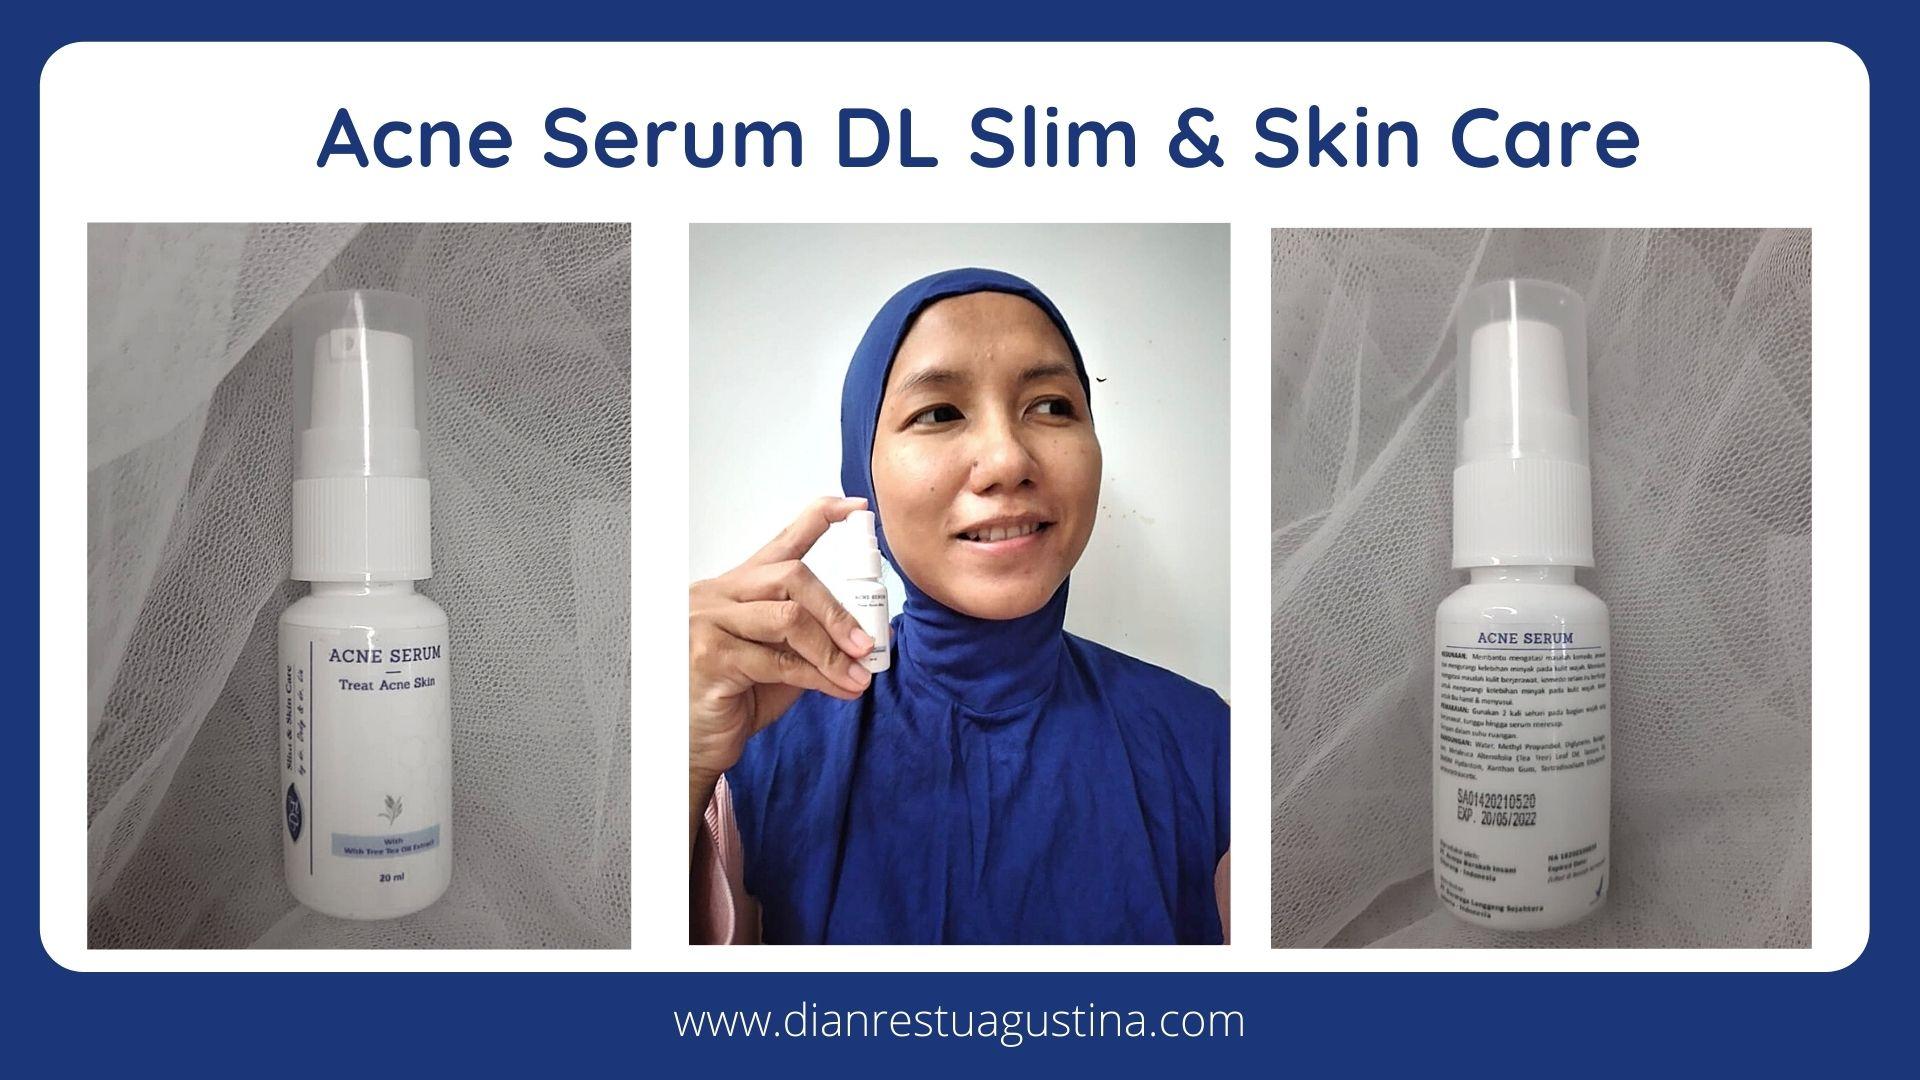 Review DL Slim & Skin Care